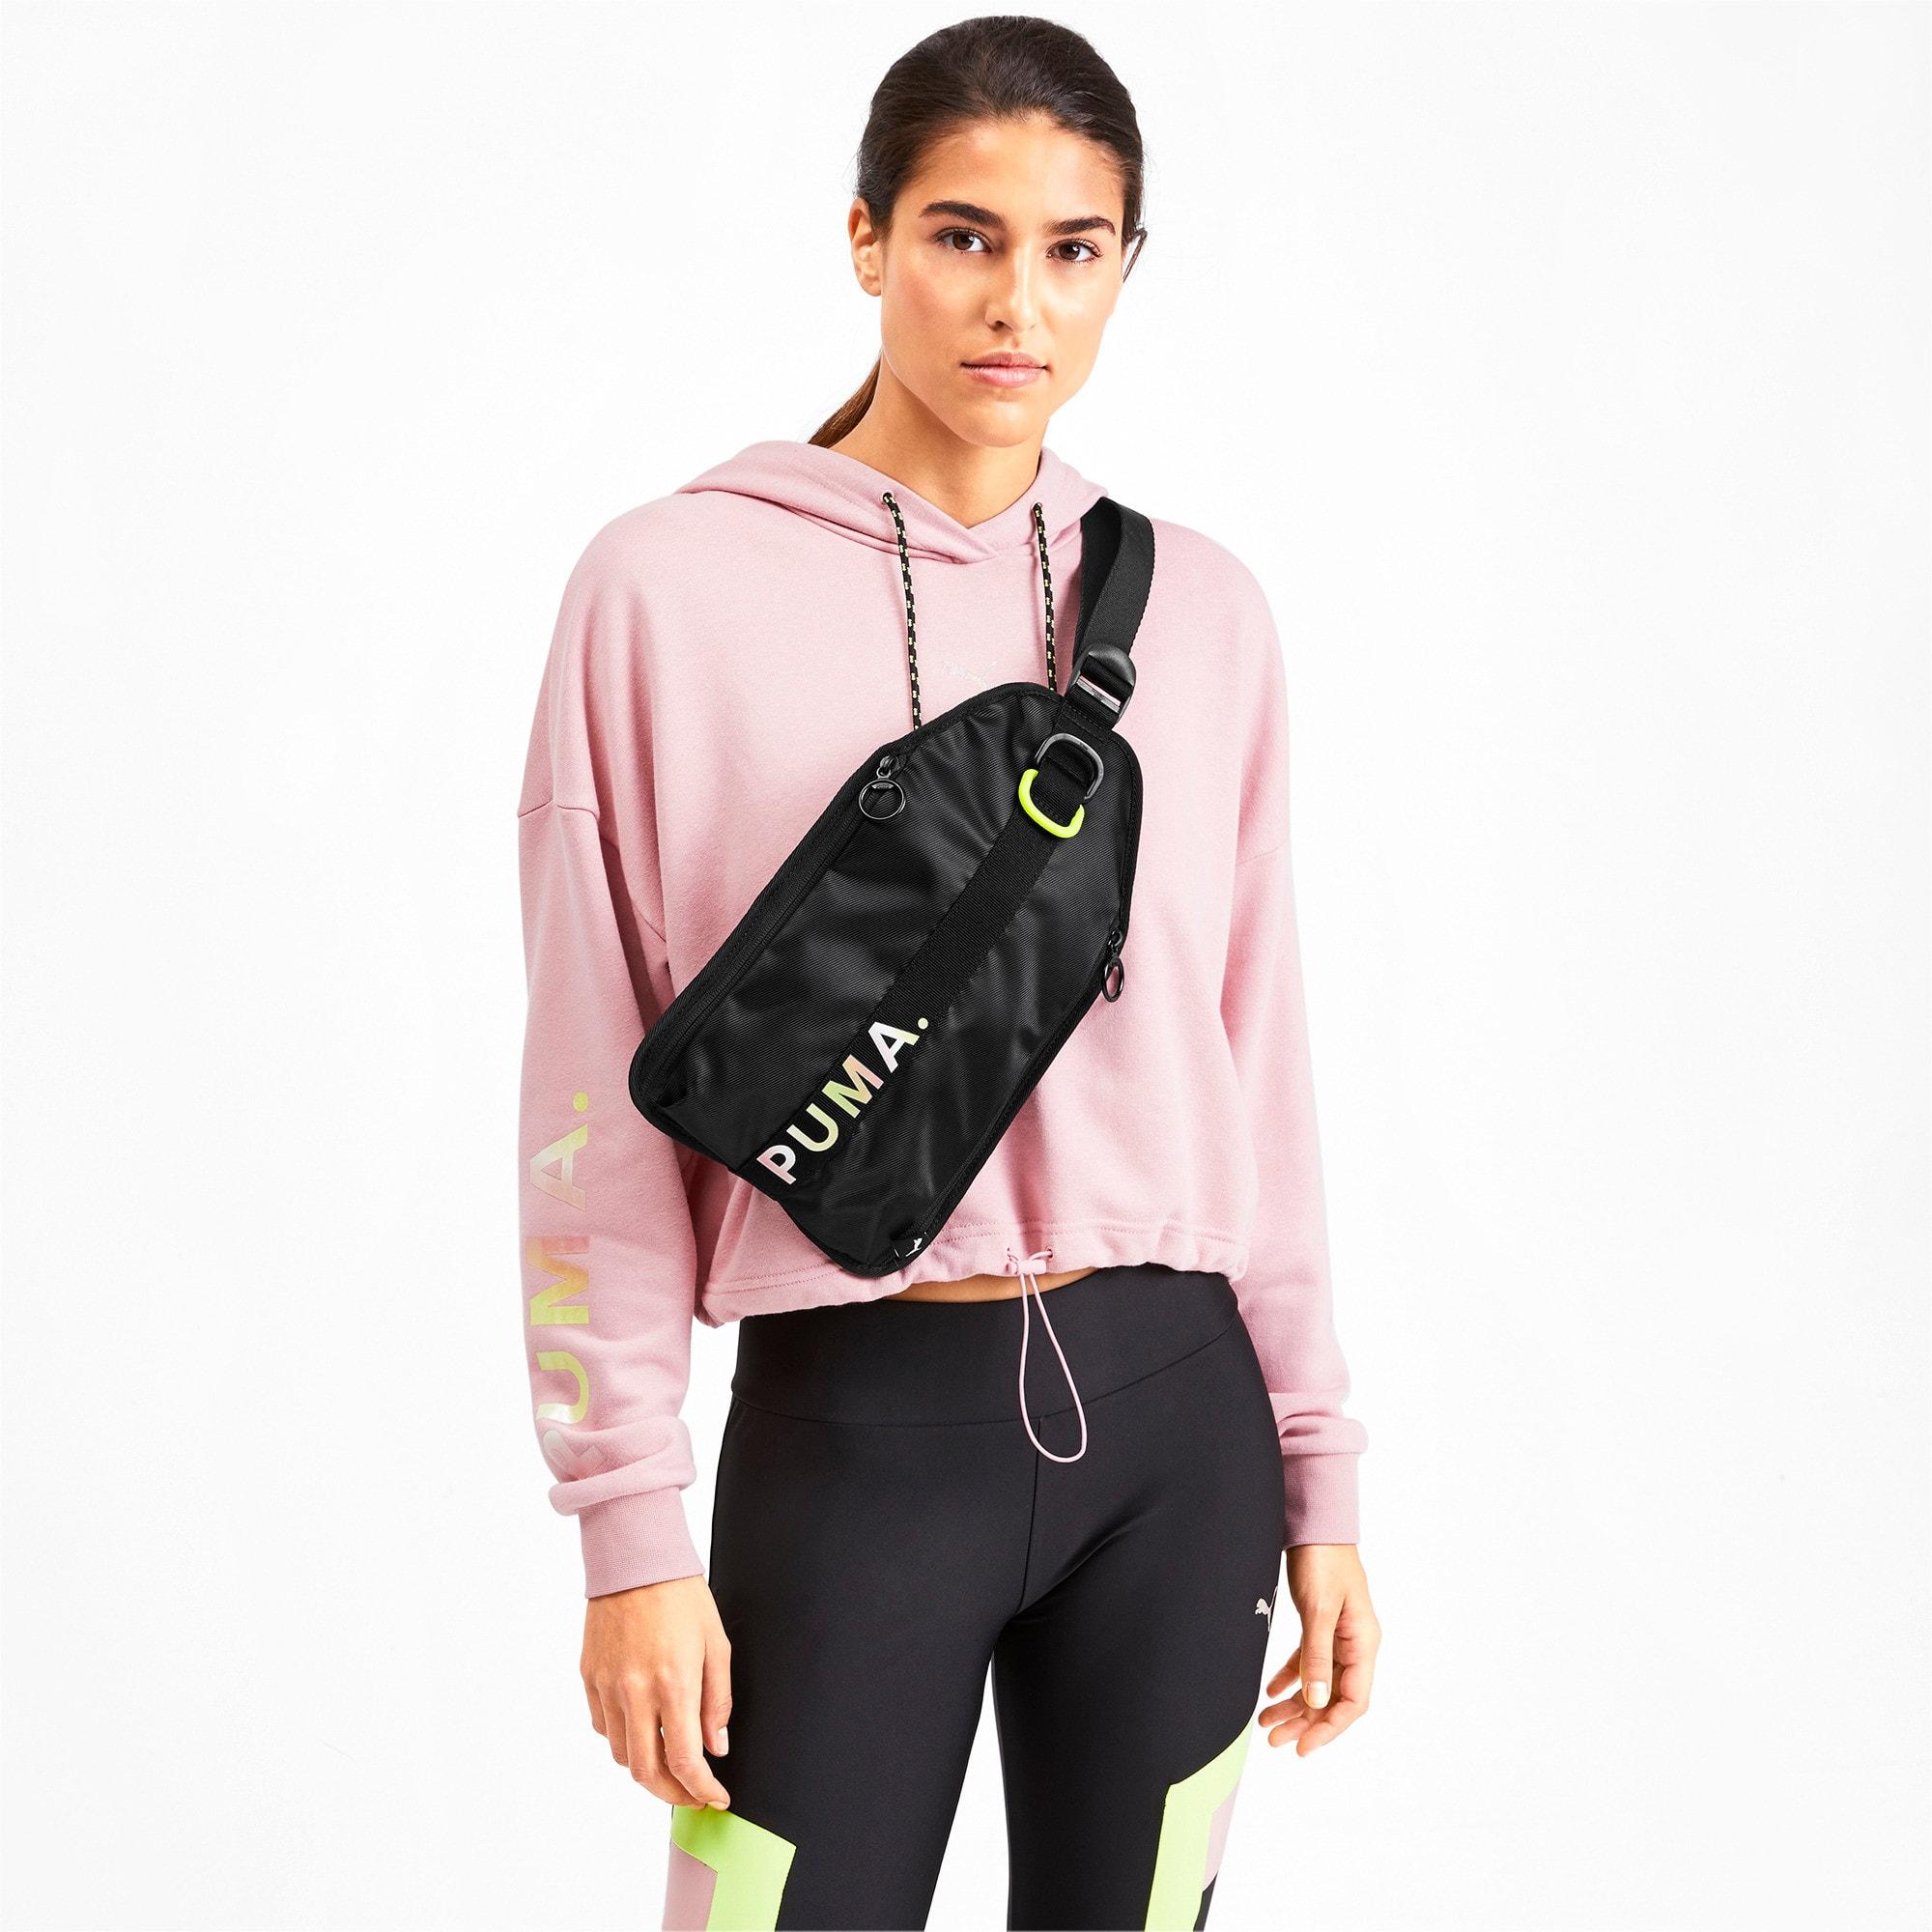 Thumbnail 2 of Prime Street Women's Sling Bag, Puma Black, medium-SEA